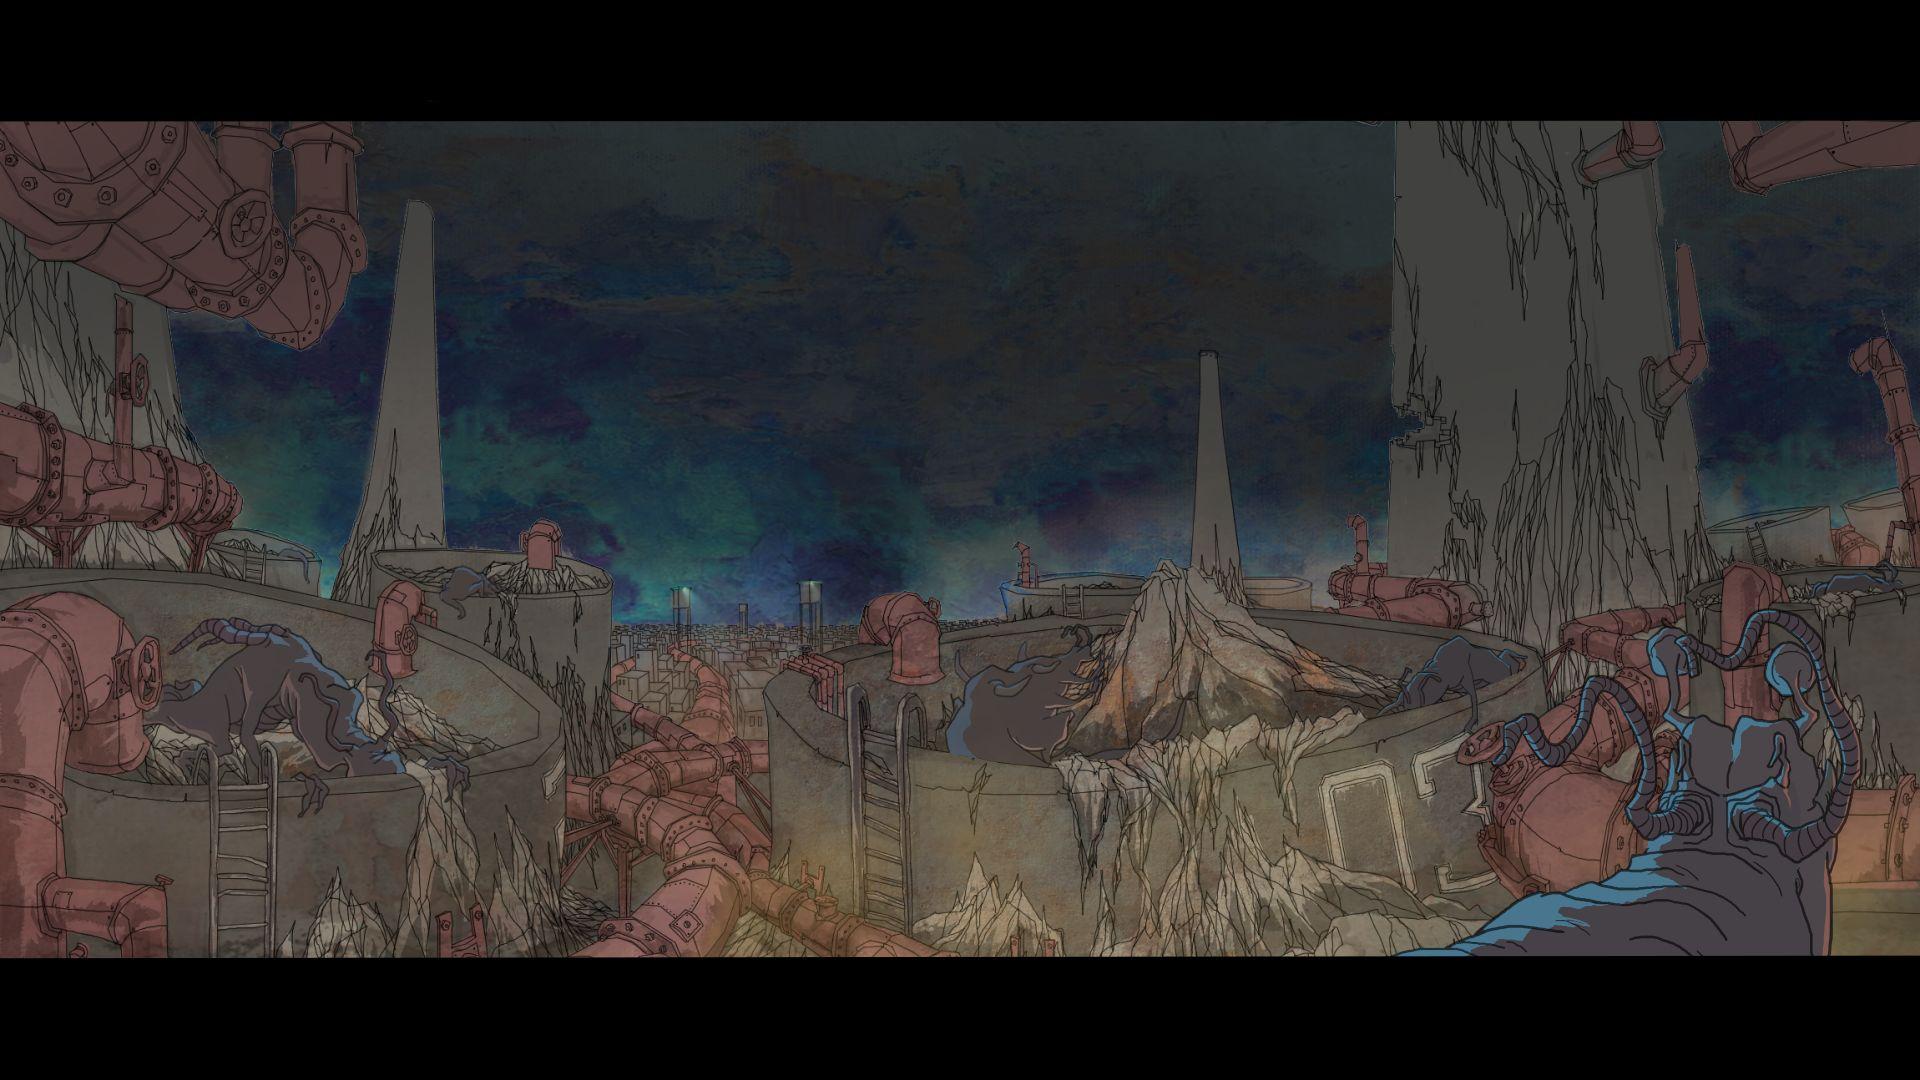 - 作品名称:《默示》导演:李秦楠联合导演:李秦楠,姚琦制片:中国美术学院国家/地区:中国创作时间:2014 编剧:李秦楠美术:李秦楠、姚琦、季望音乐:姚琦片长:9分49秒Title: ImpliedDirector: Li QinnanCo-Director: Li Qinnan, Yao Qi Producer: China Academy of Art Country/Area: ChinaYear of Production: 2014 Screenplay: Li QinnanDesign: Li Qinnan, Yao Qi, Ji Wang Music: Yao QiLength: 9 mins 49 secs作品介绍故事发生在荒芜的大漠上,一座军事禁区里群居着数量庞大的外星生物(大A),他们早期是被人类抓来进行生化试验而后被圈养在禁区内,人类的承诺让他们相信终有一日能重返家园,而人类要求他们进行的消毒处理实质是分批次的屠杀,整个阴谋虽然最终揭发但也为时过晚。Synopsis The story takes place in the barren desert which is a military restricted zones where live a large number of aliens (A). These alien creatures were captured by human beings in the early time for the biochemical experiment, but then were kept in this area. Human beings have promised them that they would go back home one day. However, the essence of the disinfection treatment on the aliens by human is a massacre in batches. The horrible fact has finally been exposed but it is too late.